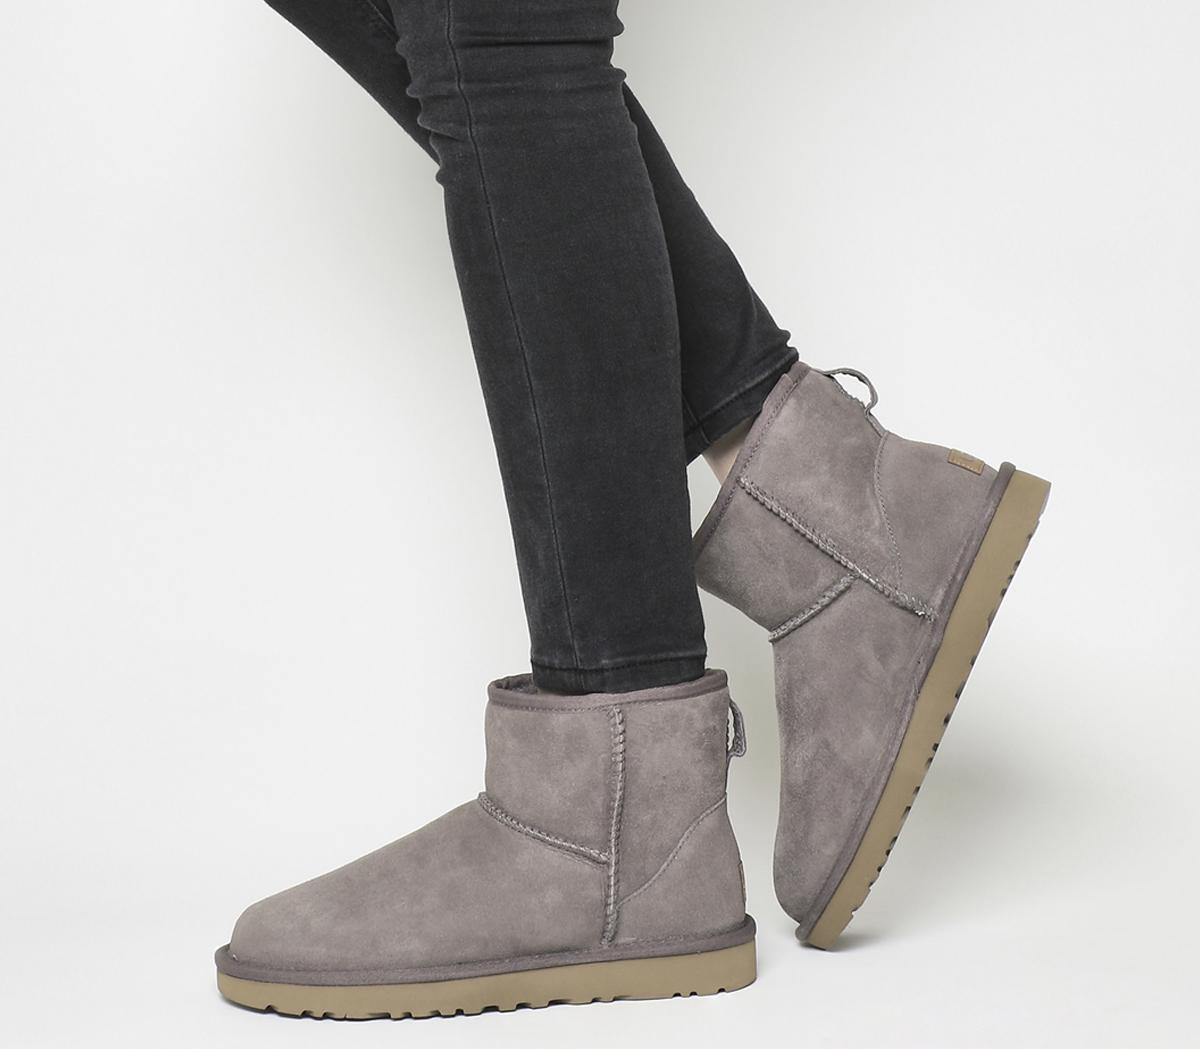 UGG Classic Mini II Boots Stormy Grey